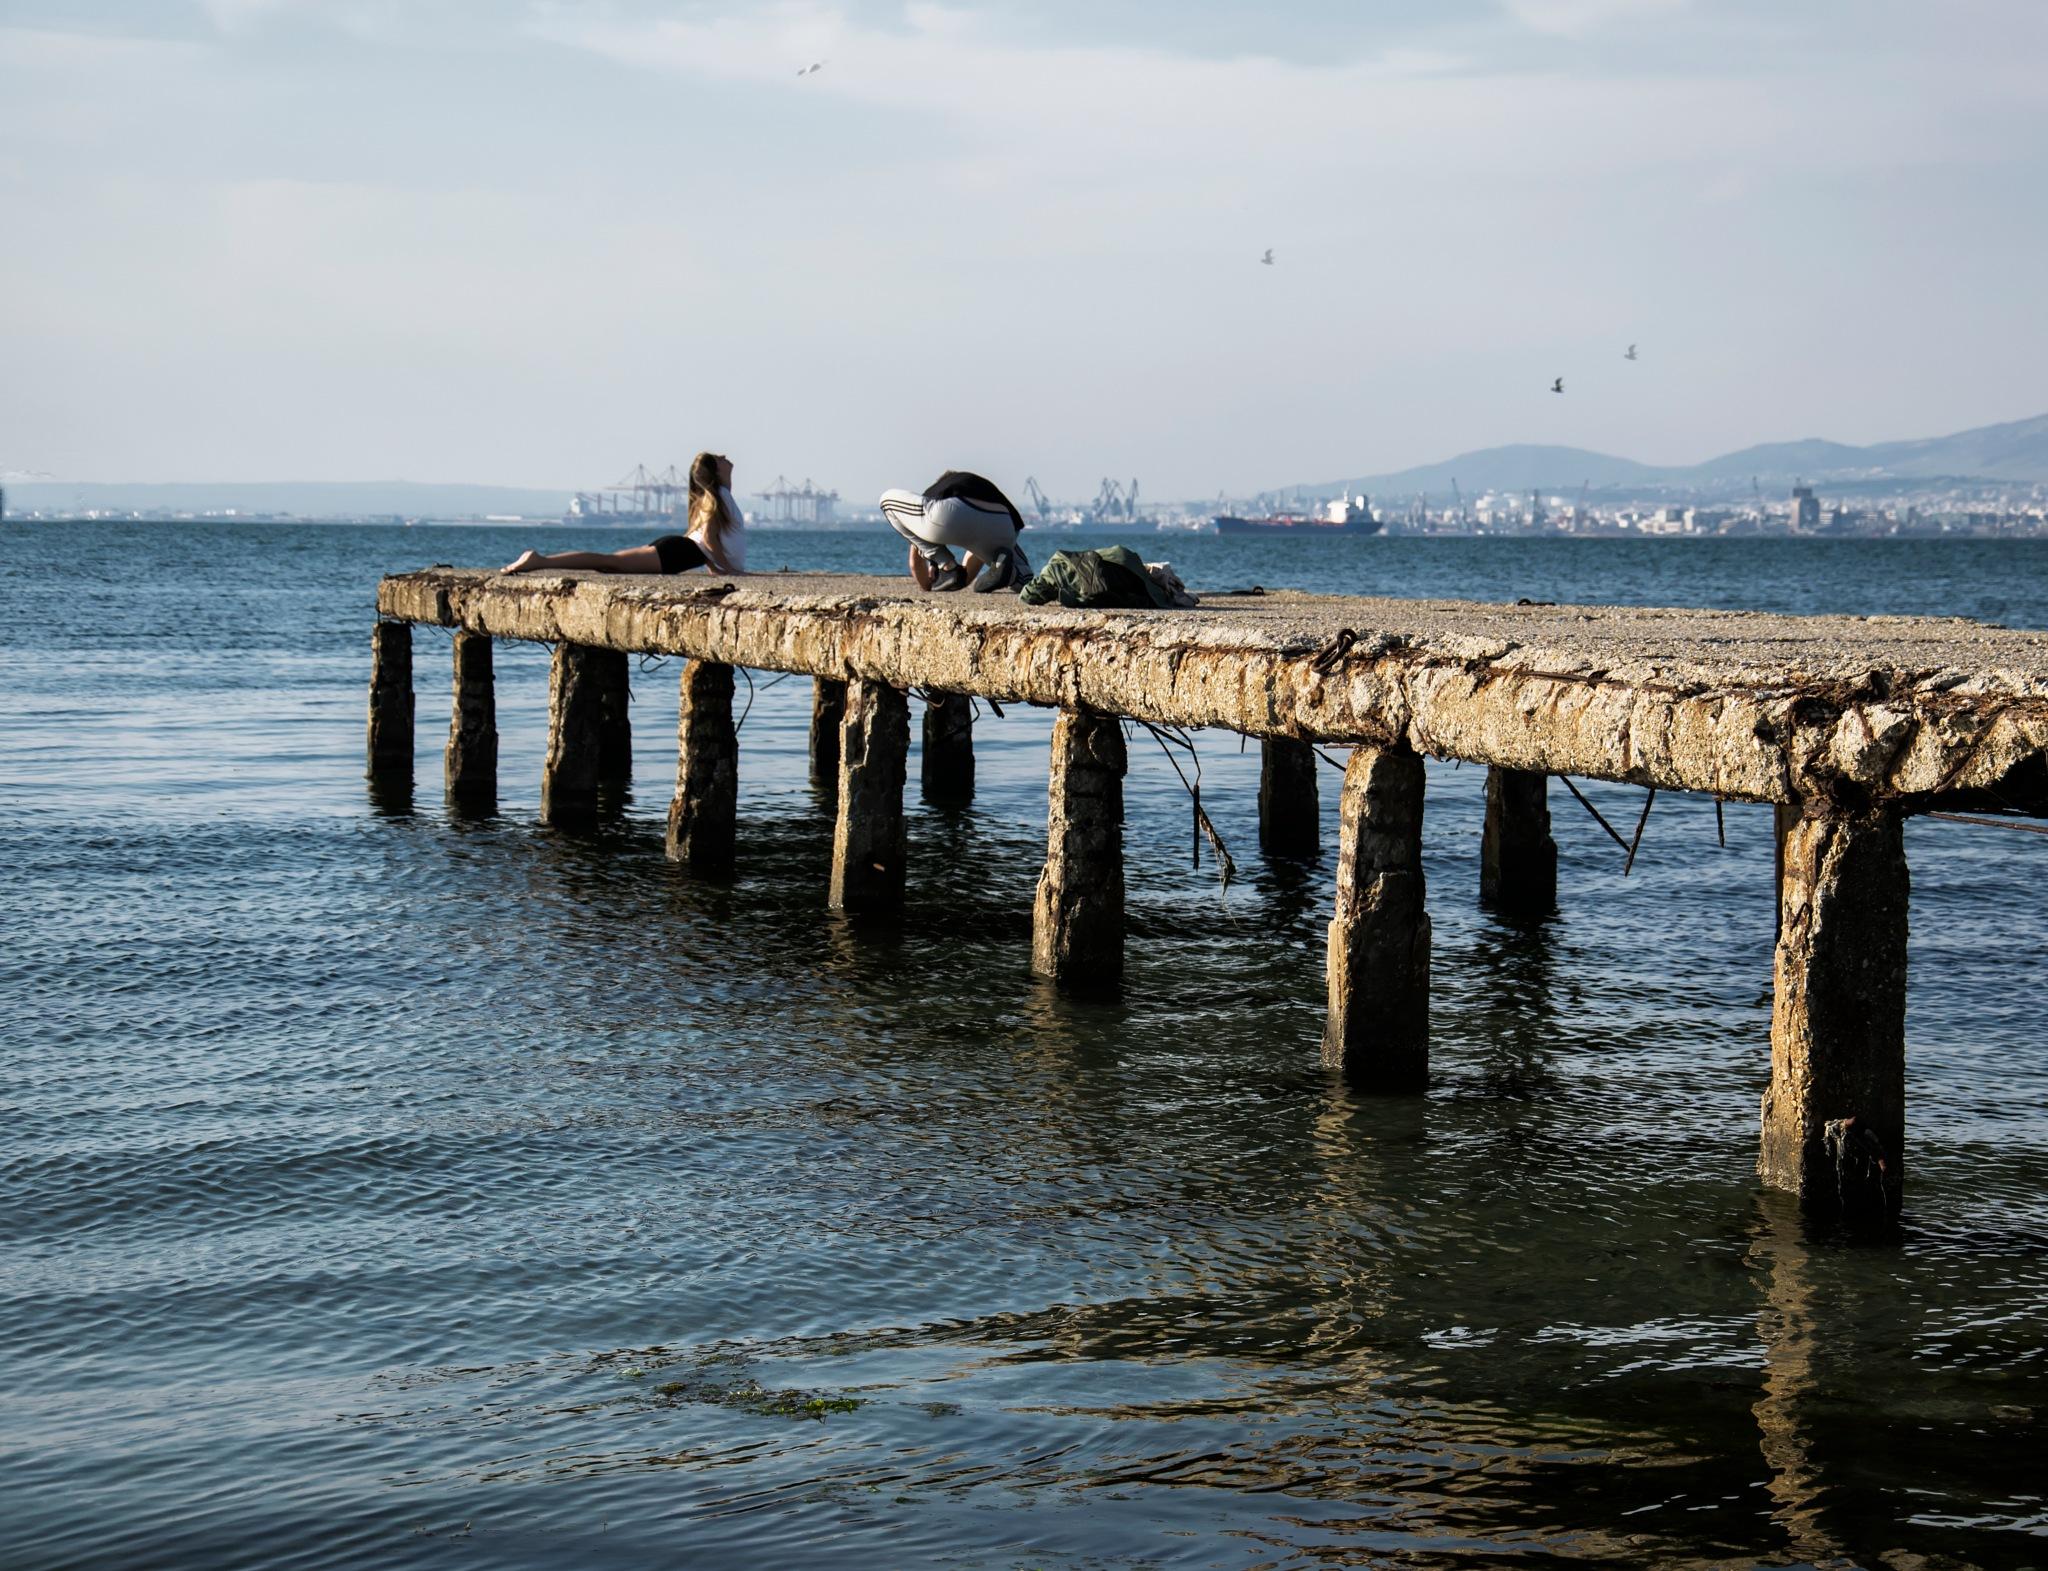 Gymnastics at pier by katerinaxatziavramoglou